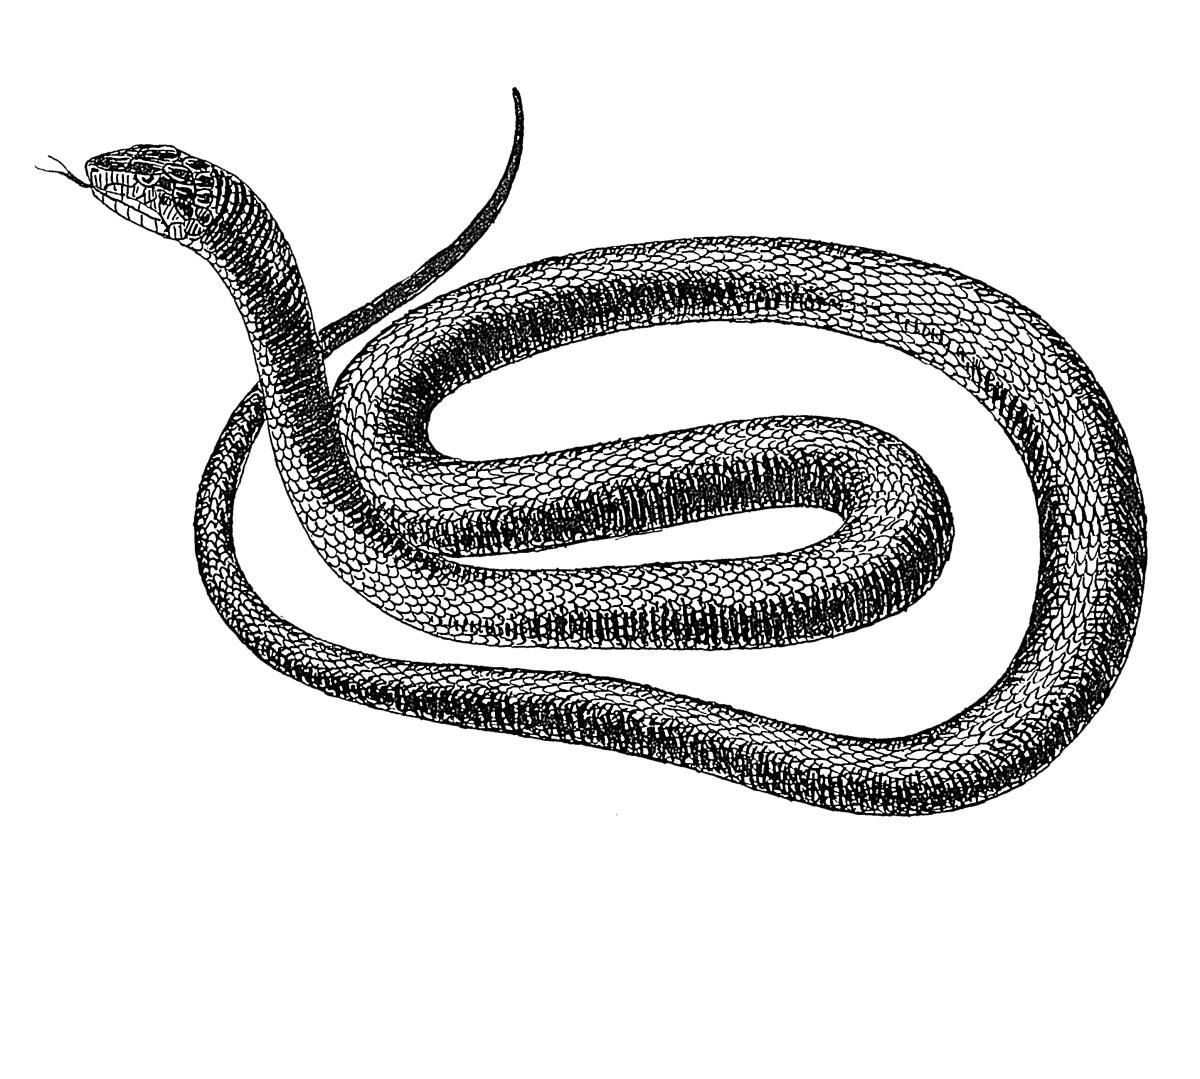 Drawn snake long snake Lac  Mithradates Fond of